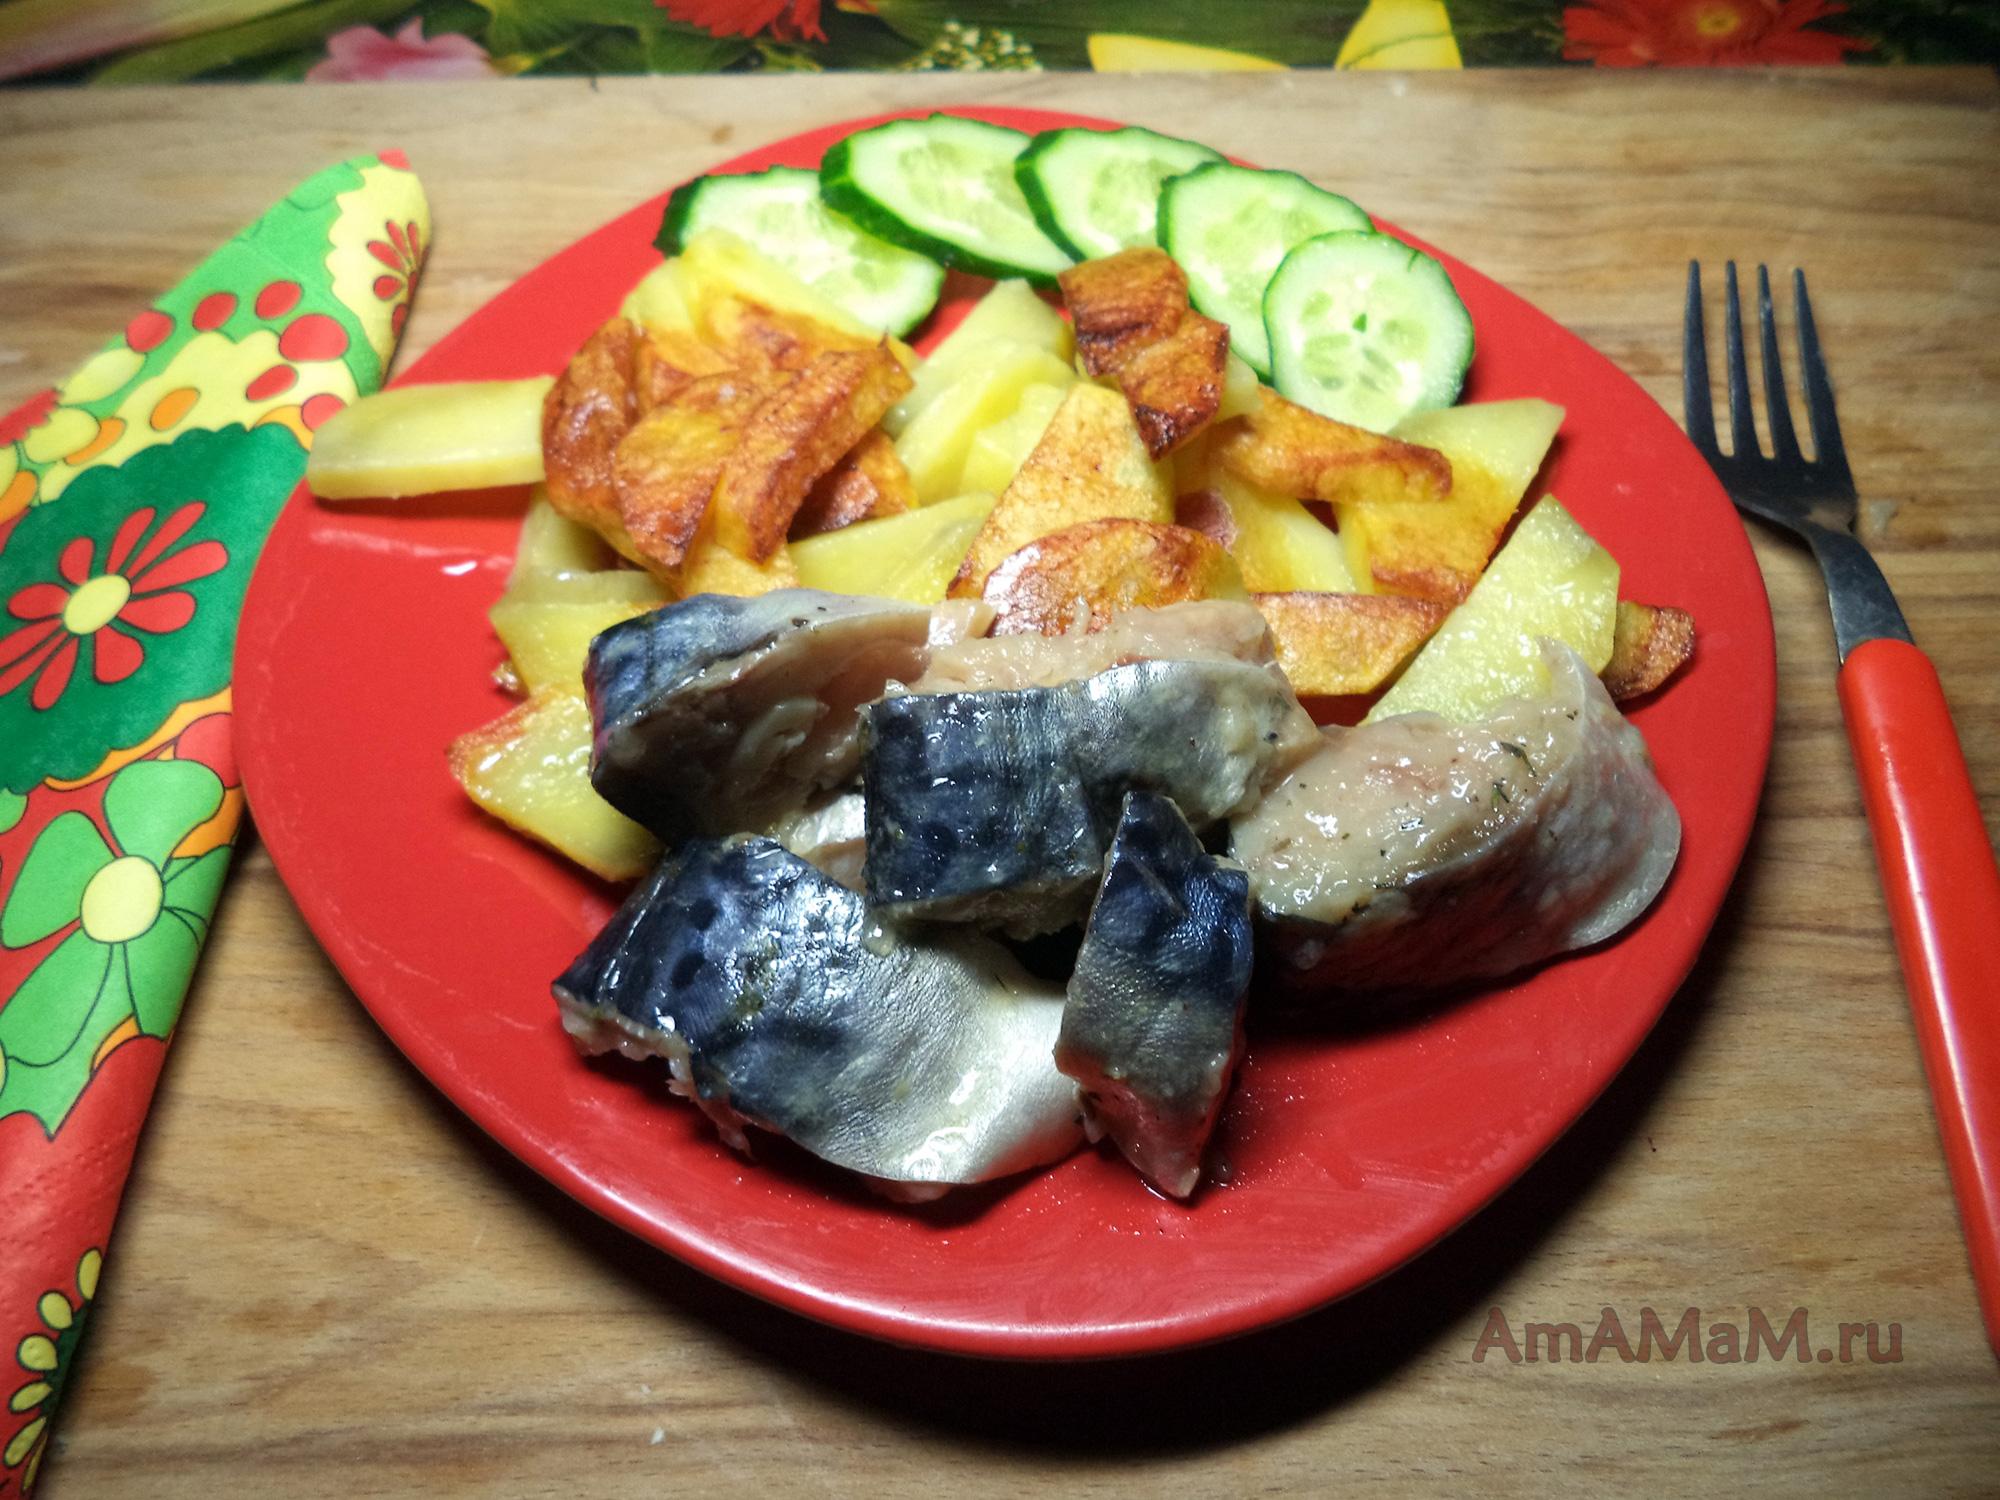 Засолка сельди в домашних условиях: рецепт Чудо-Повар 18